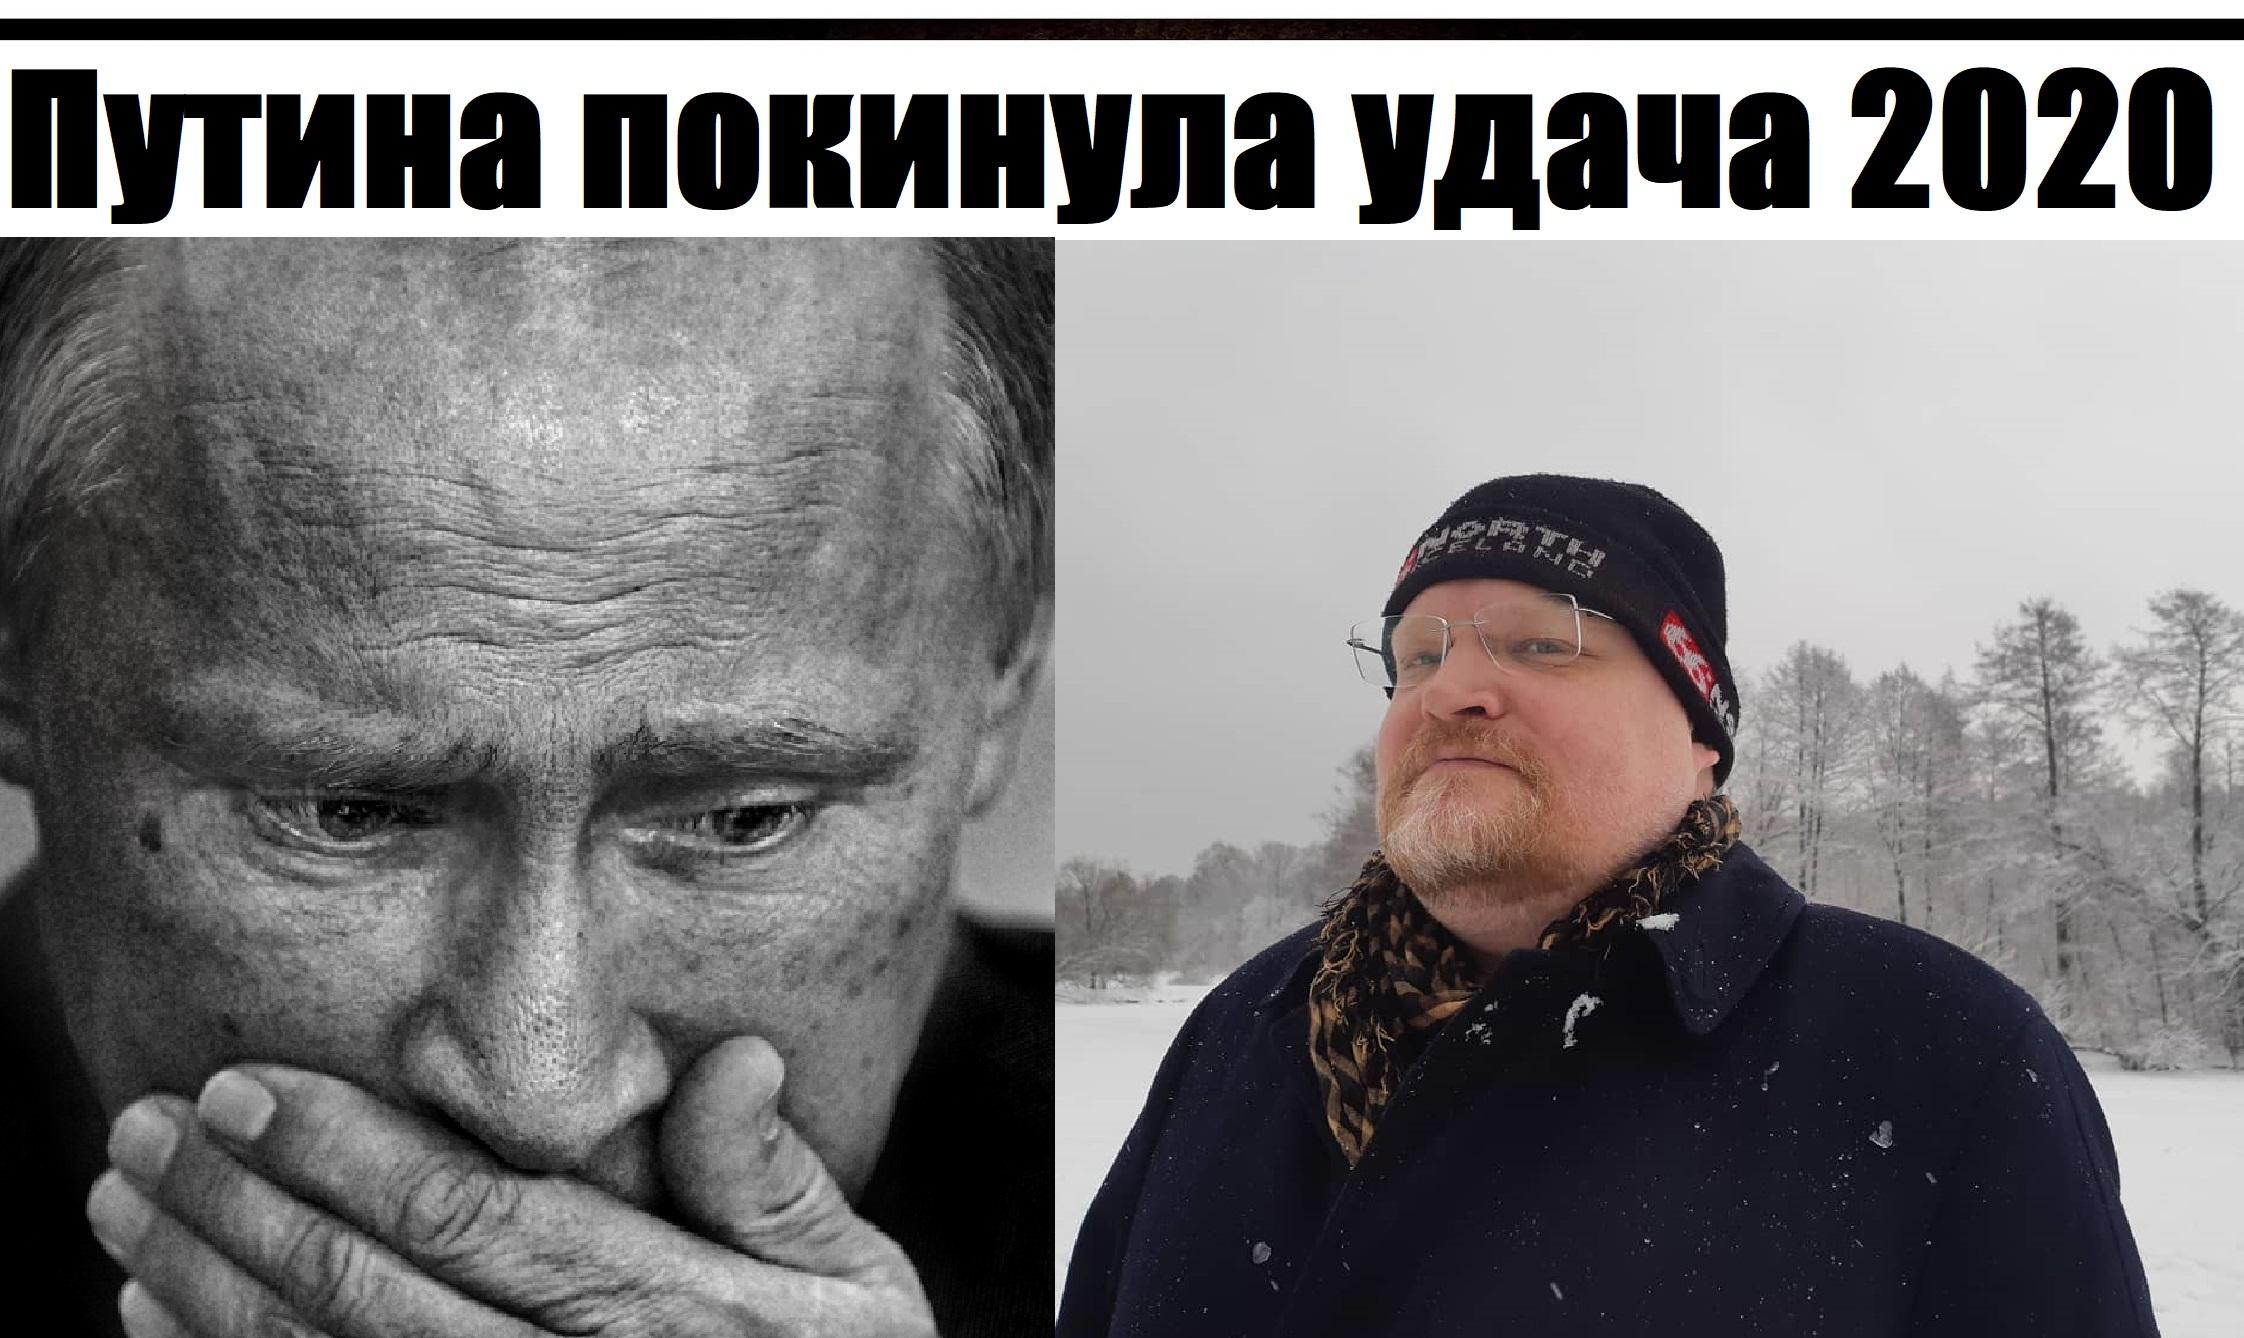 Путин потерял удачу